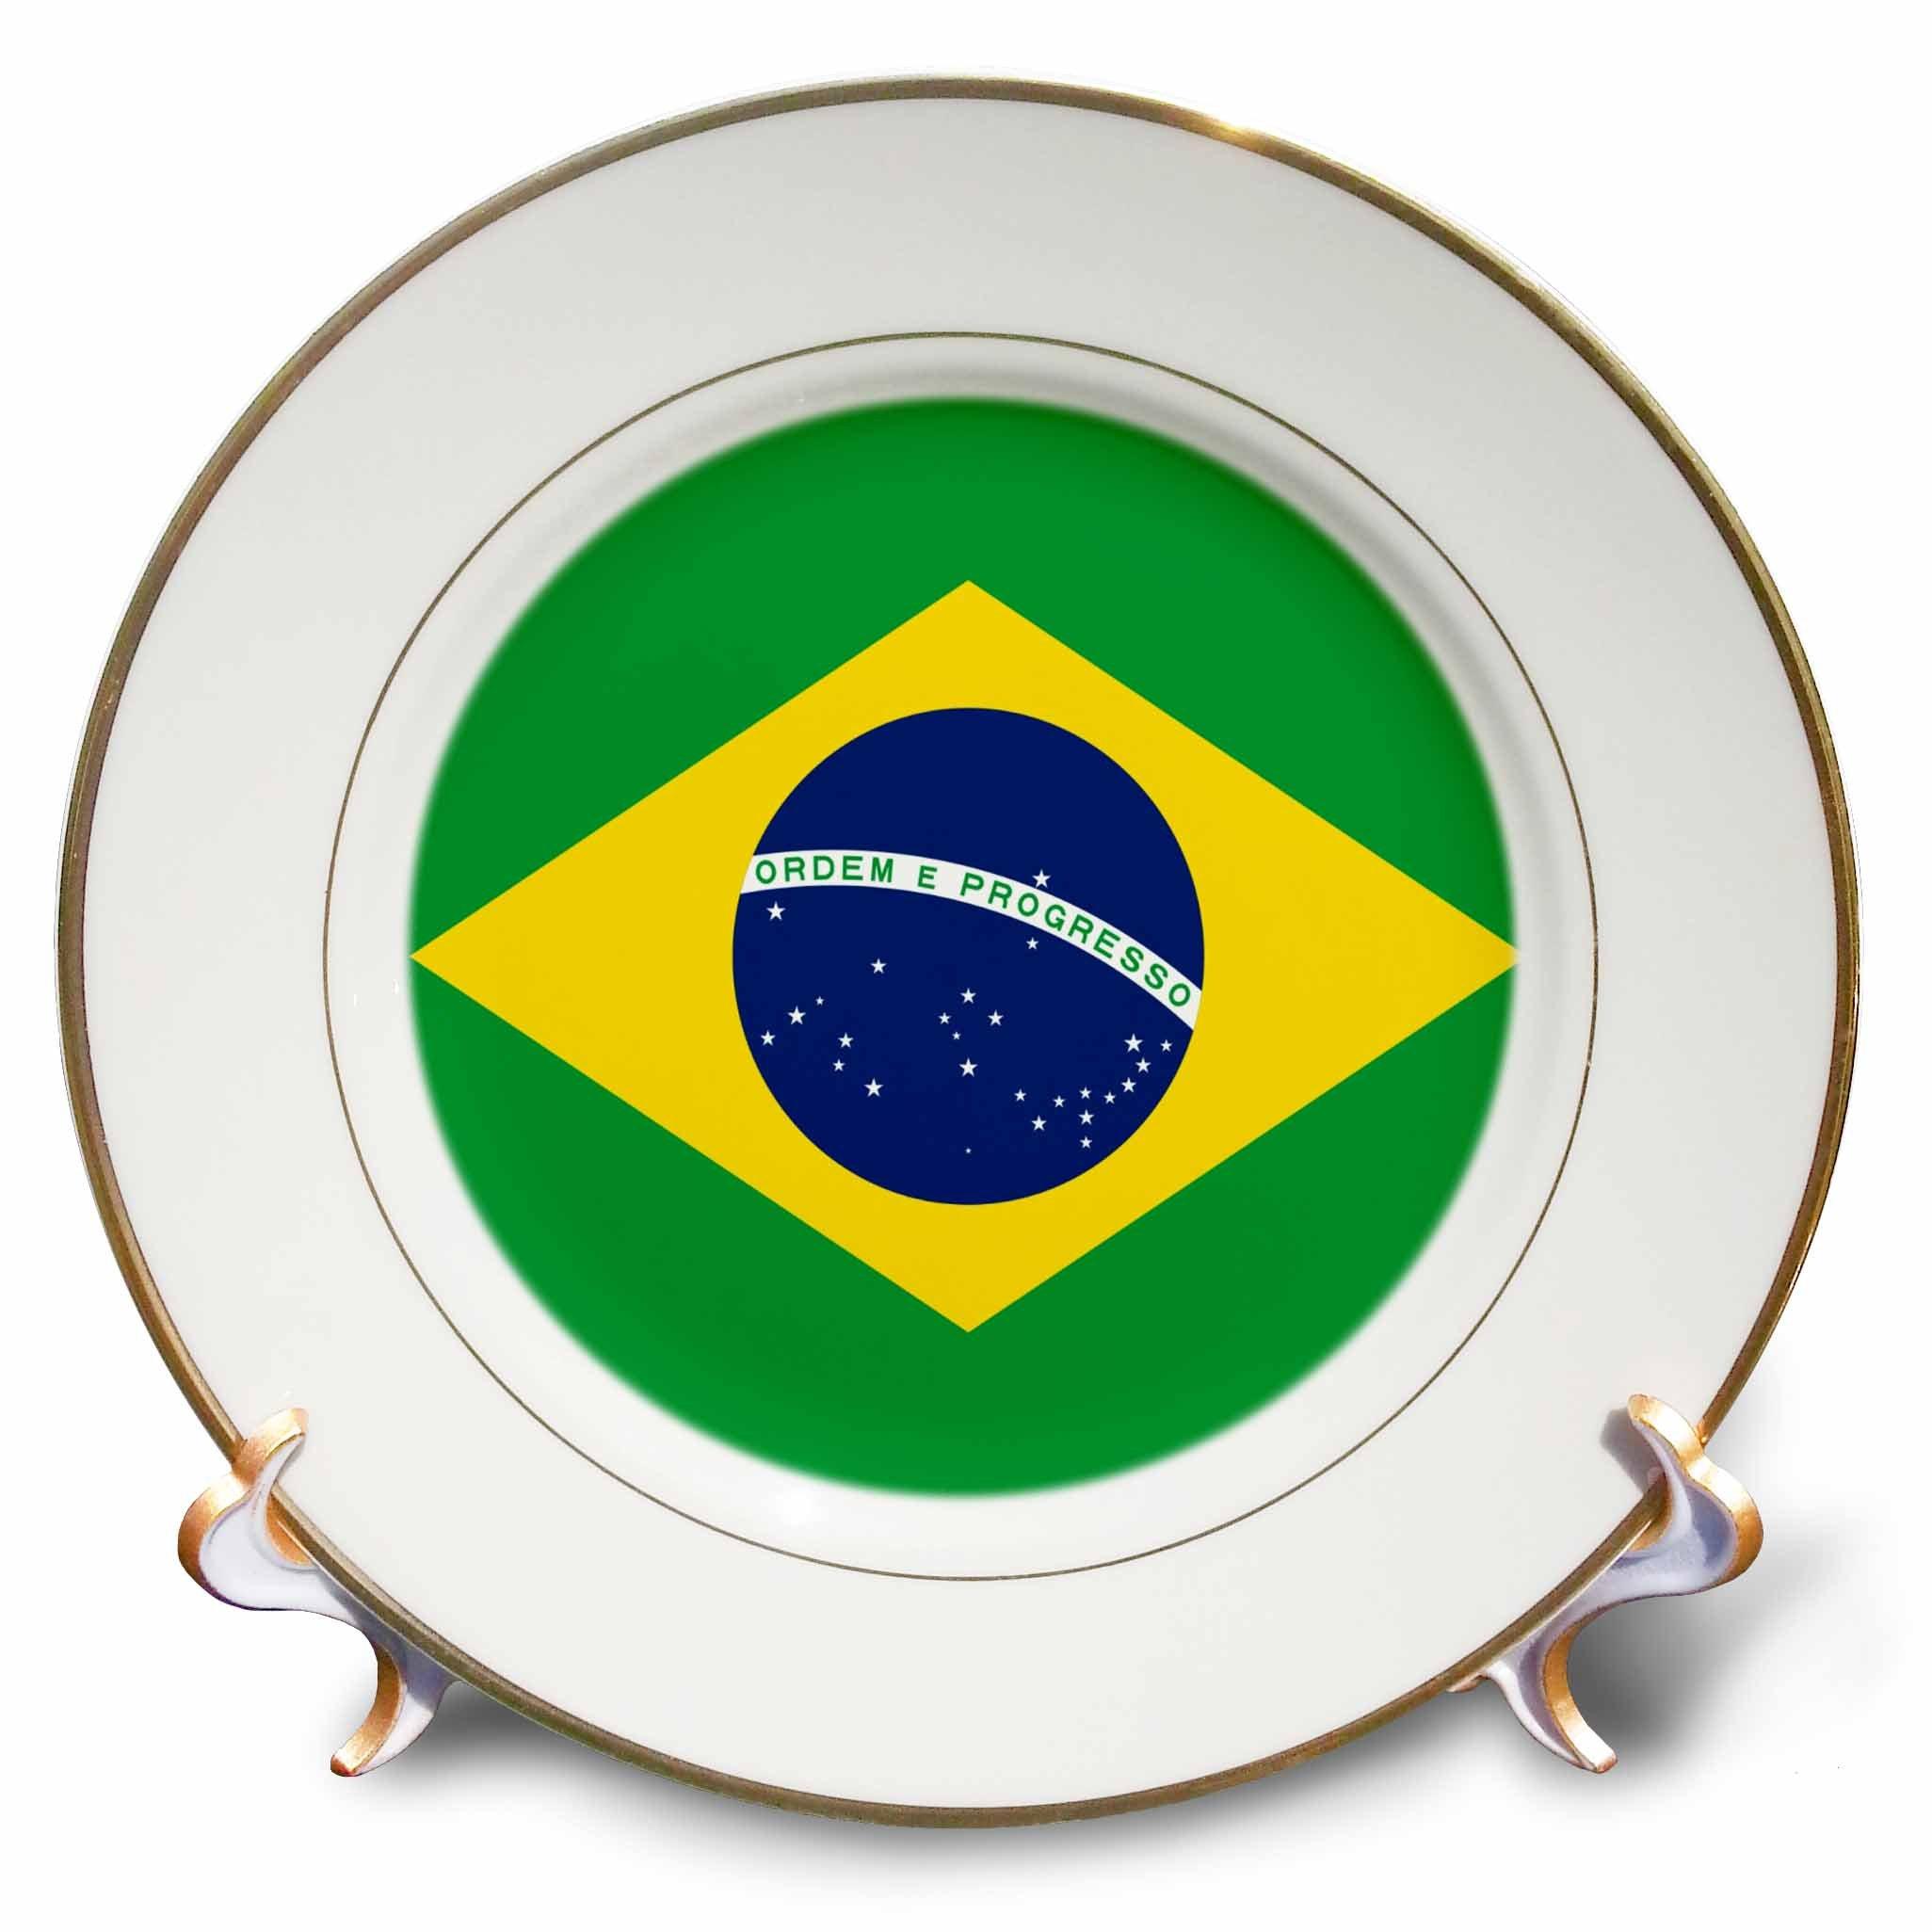 e70554a6a33 Galleon - 3dRose Cp 157837 1 Flag Of Brazil Bandeira Do Brasil Brazilian  Green Yellow Rhombus With Dark Blue Circle 27 Stars Porcelain Plate